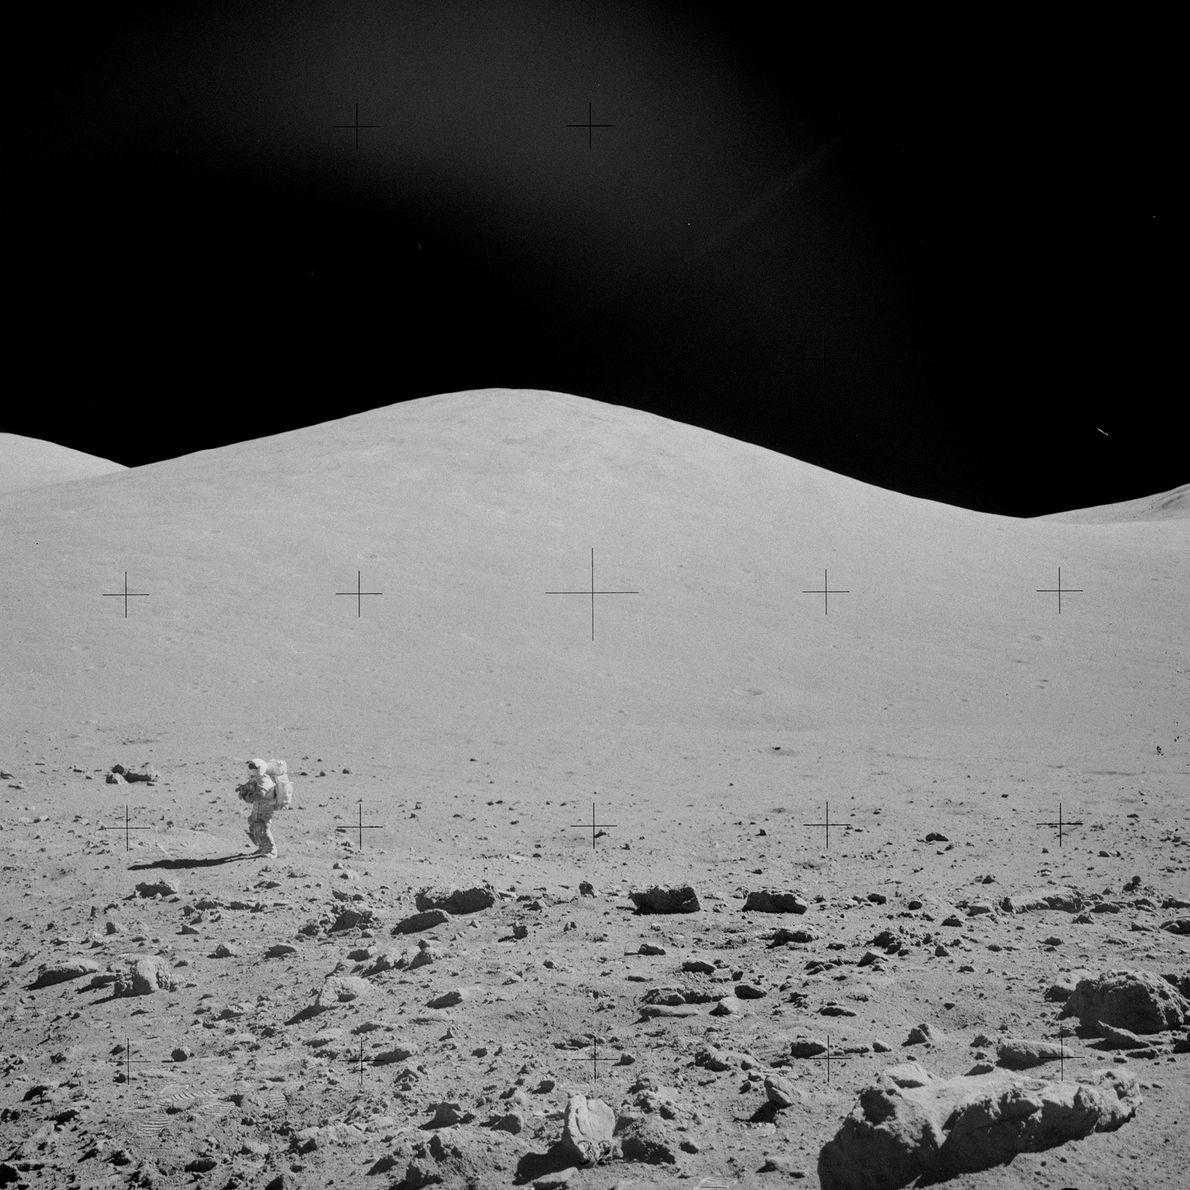 Gene Cernan, the commander of Apollo 17, walks on the lunar surface near the Van Serg ...